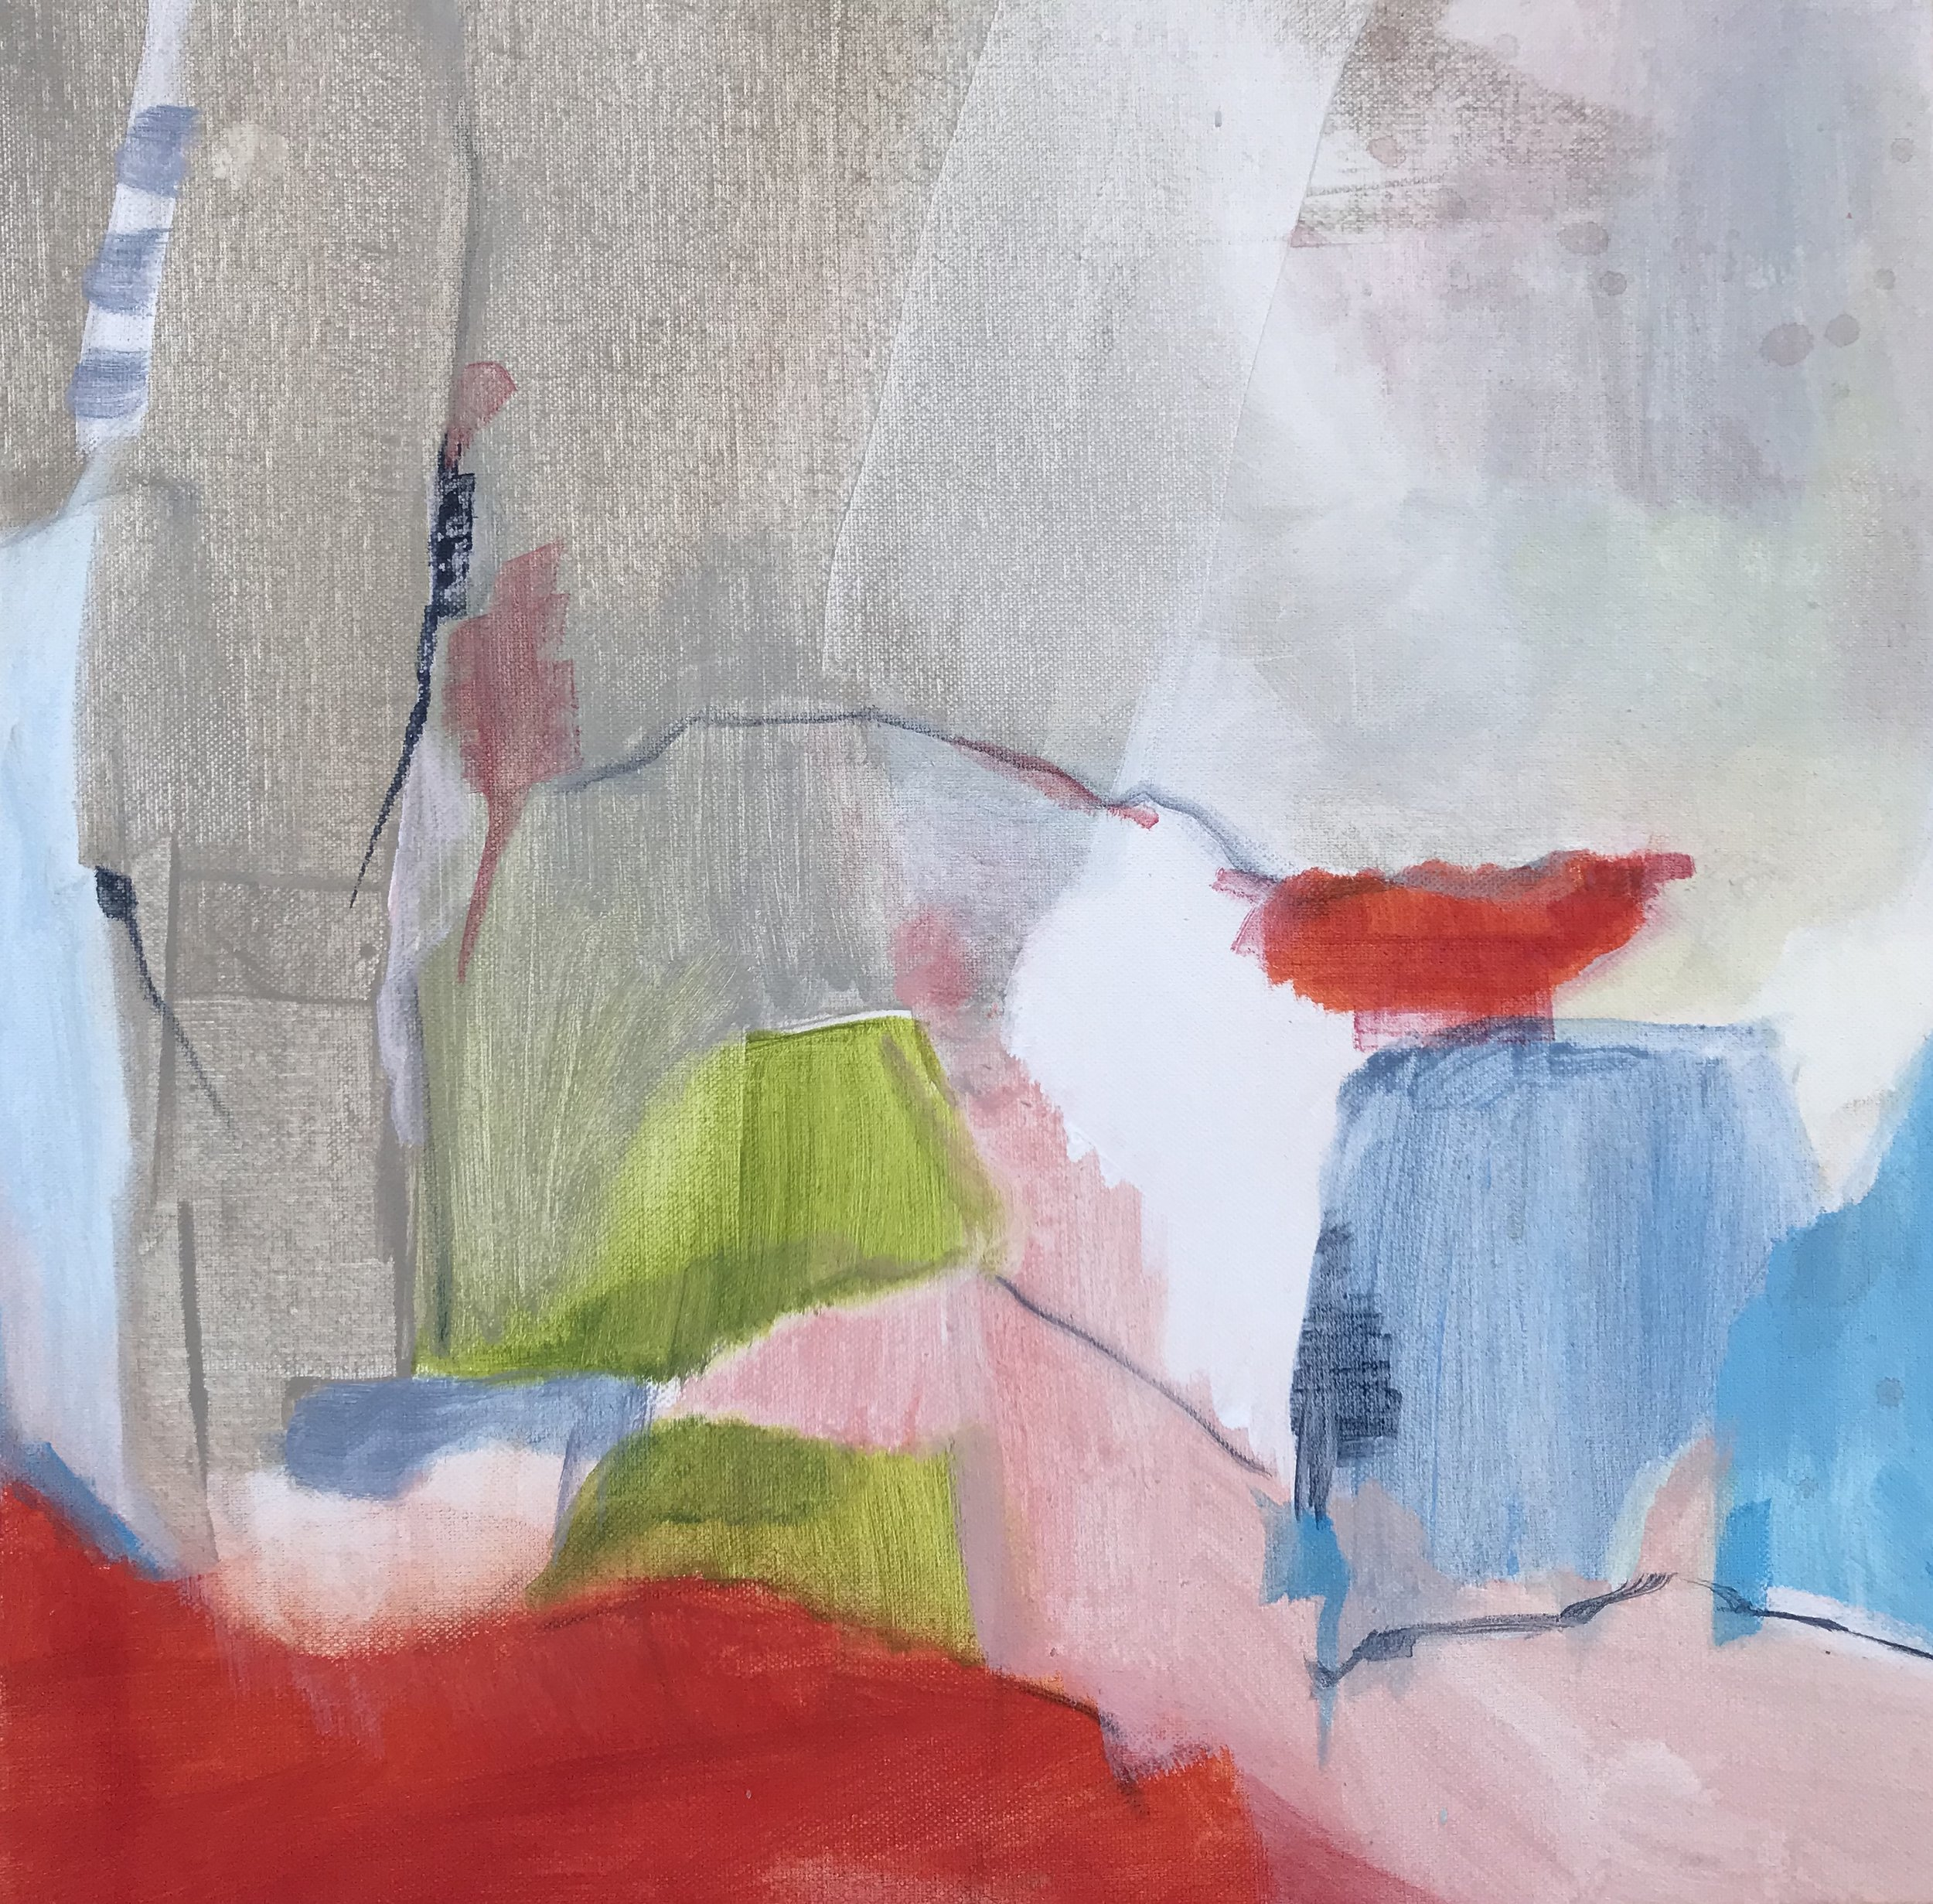 Tethered, Acrylic on Canvas, 16 x 16